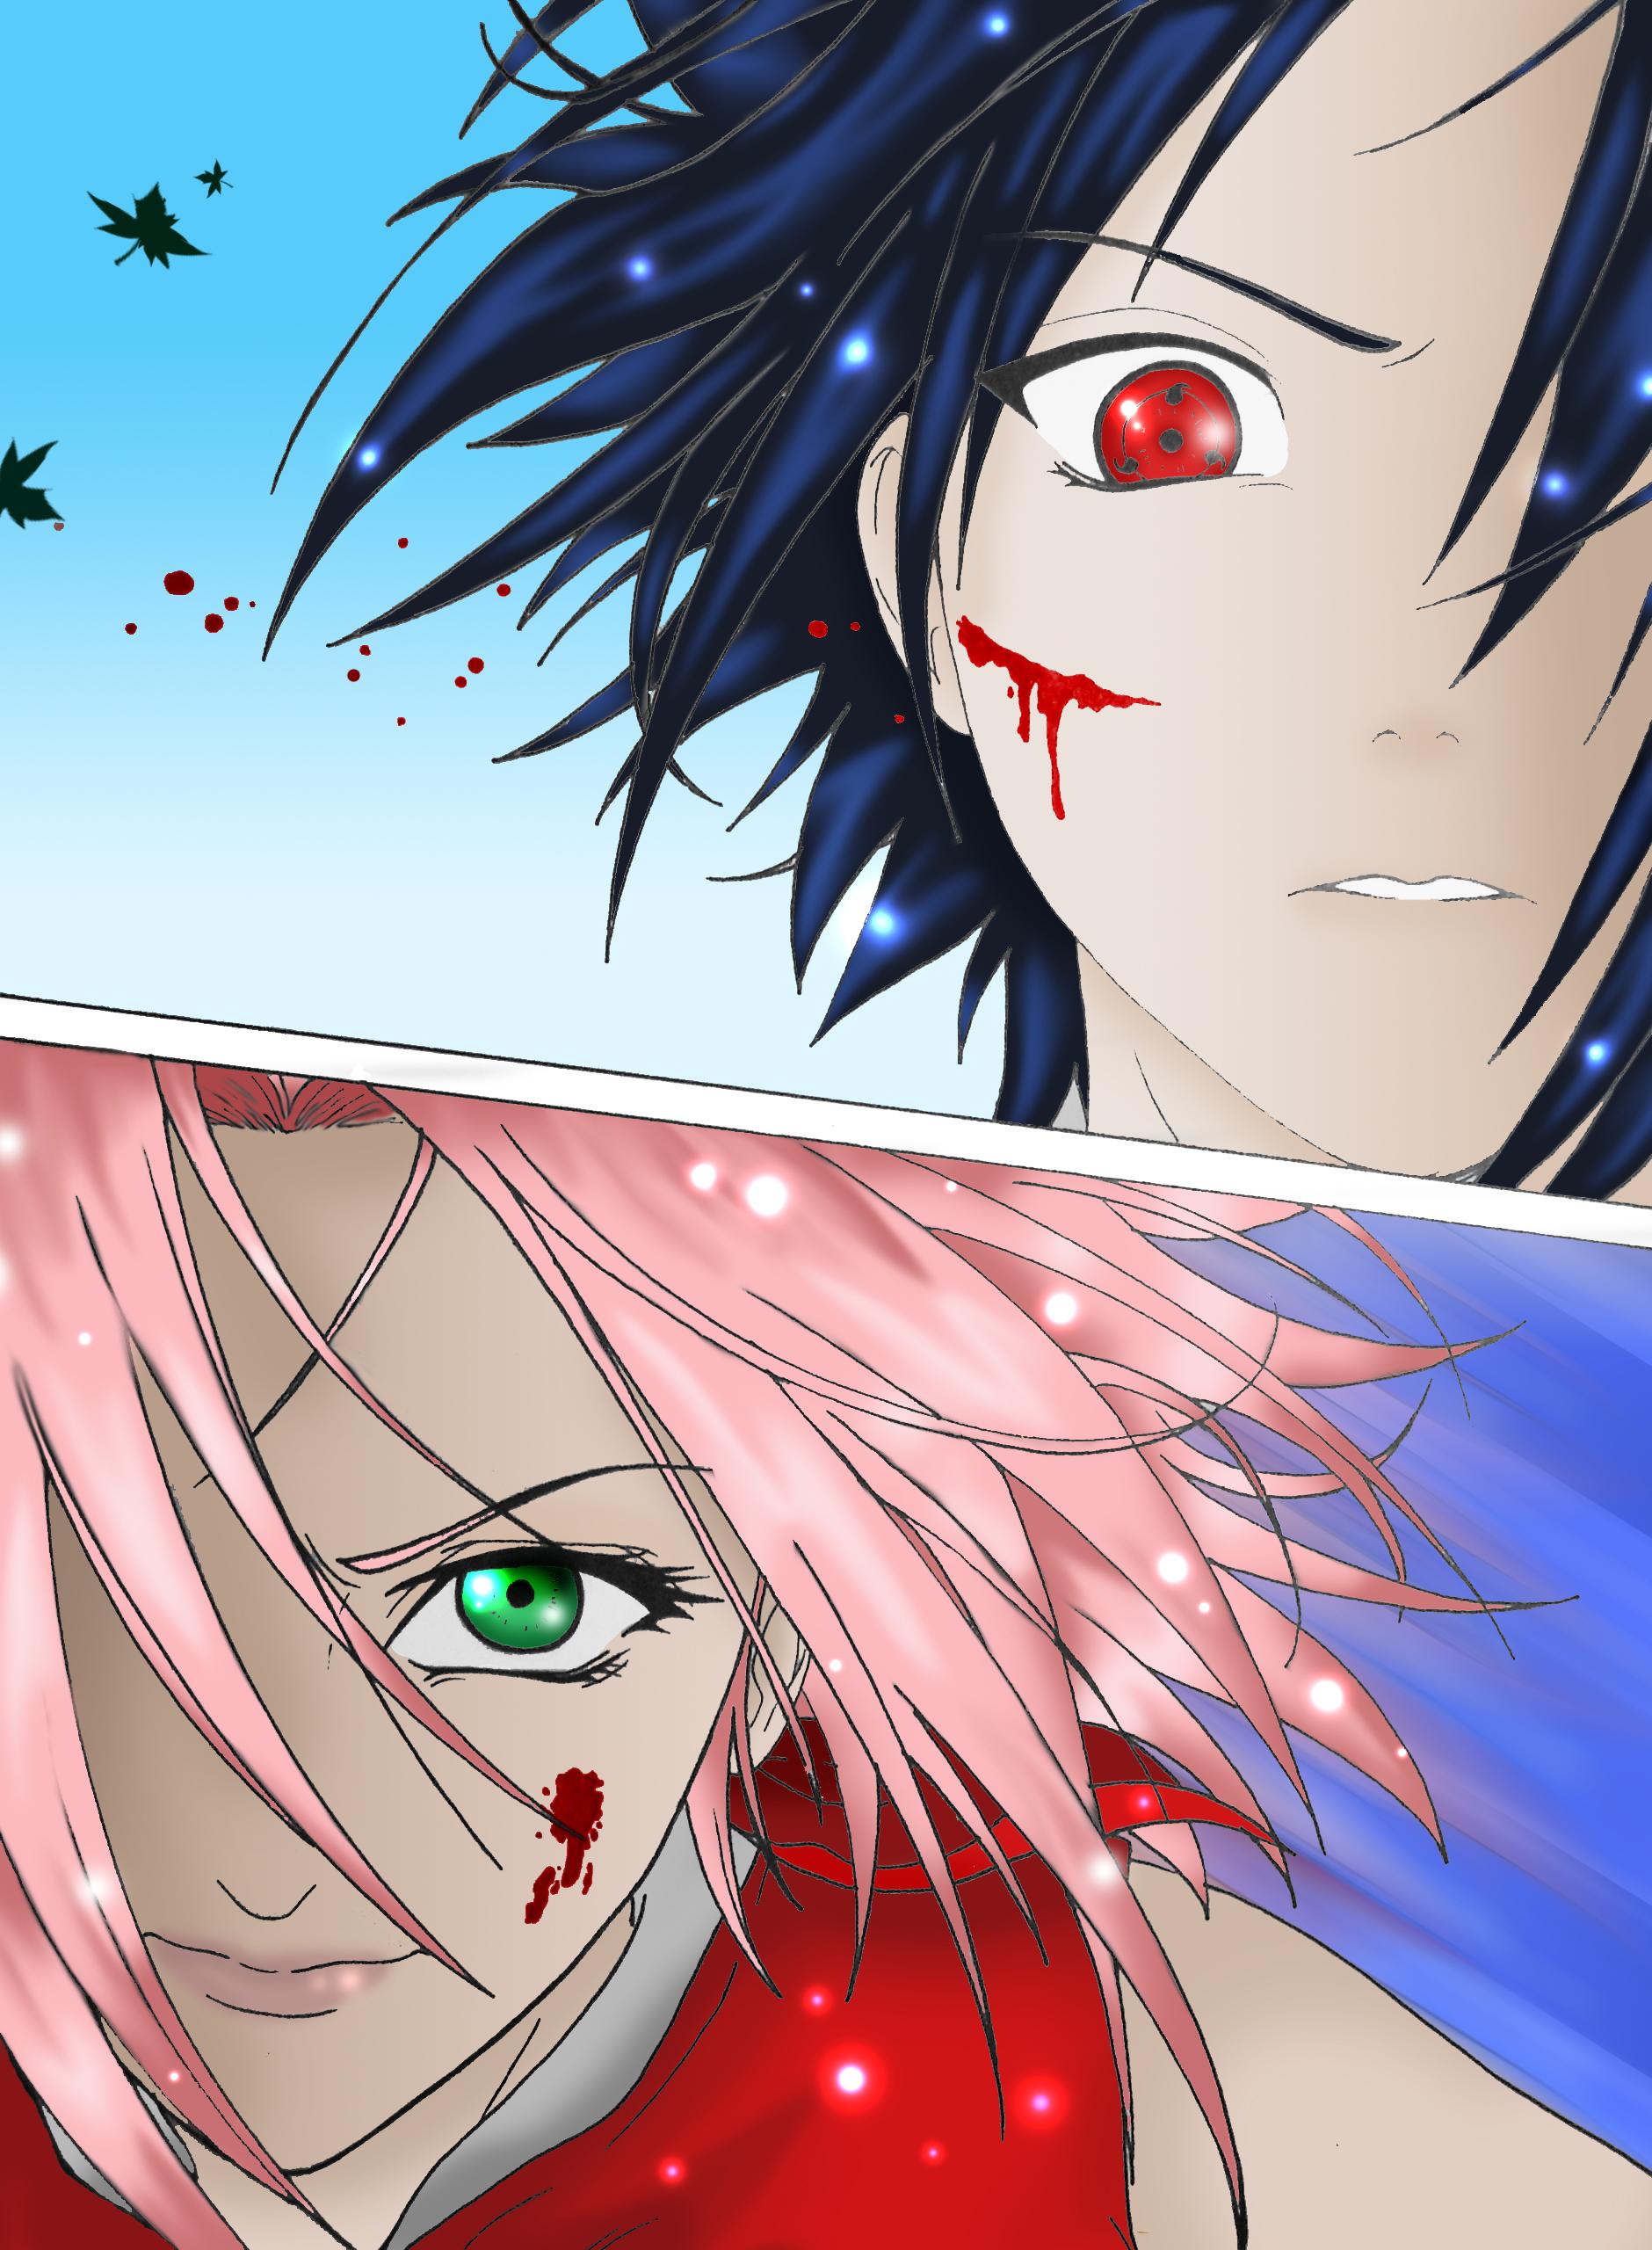 http://fc30.deviantart.com/fs26/f/2008/040/7/b/Sakura_vs_Sasuke_by_MuzzaThePerv.jpg